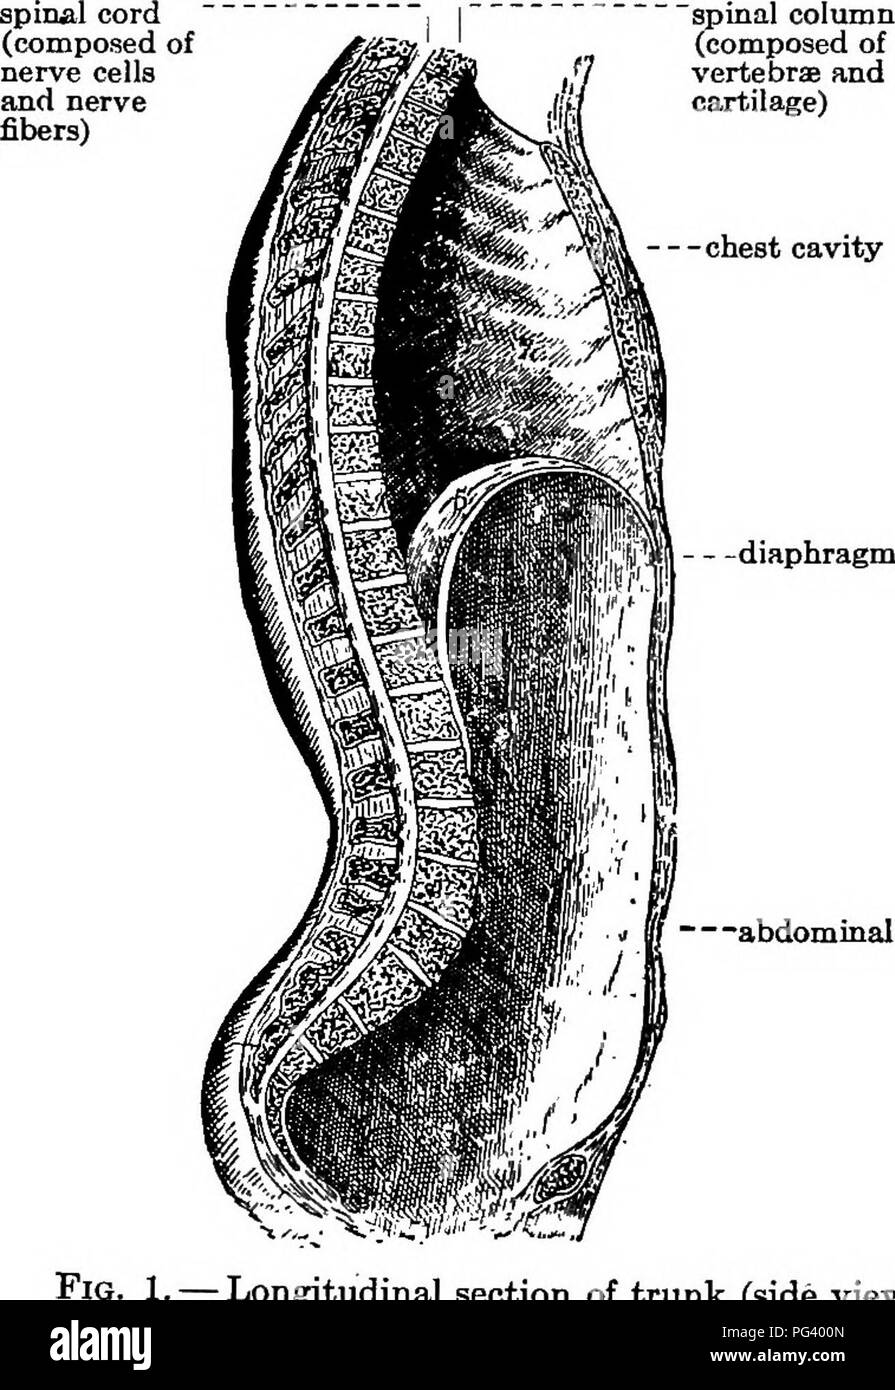 Elementary Biology Animal And Human Biology Human Biology Body